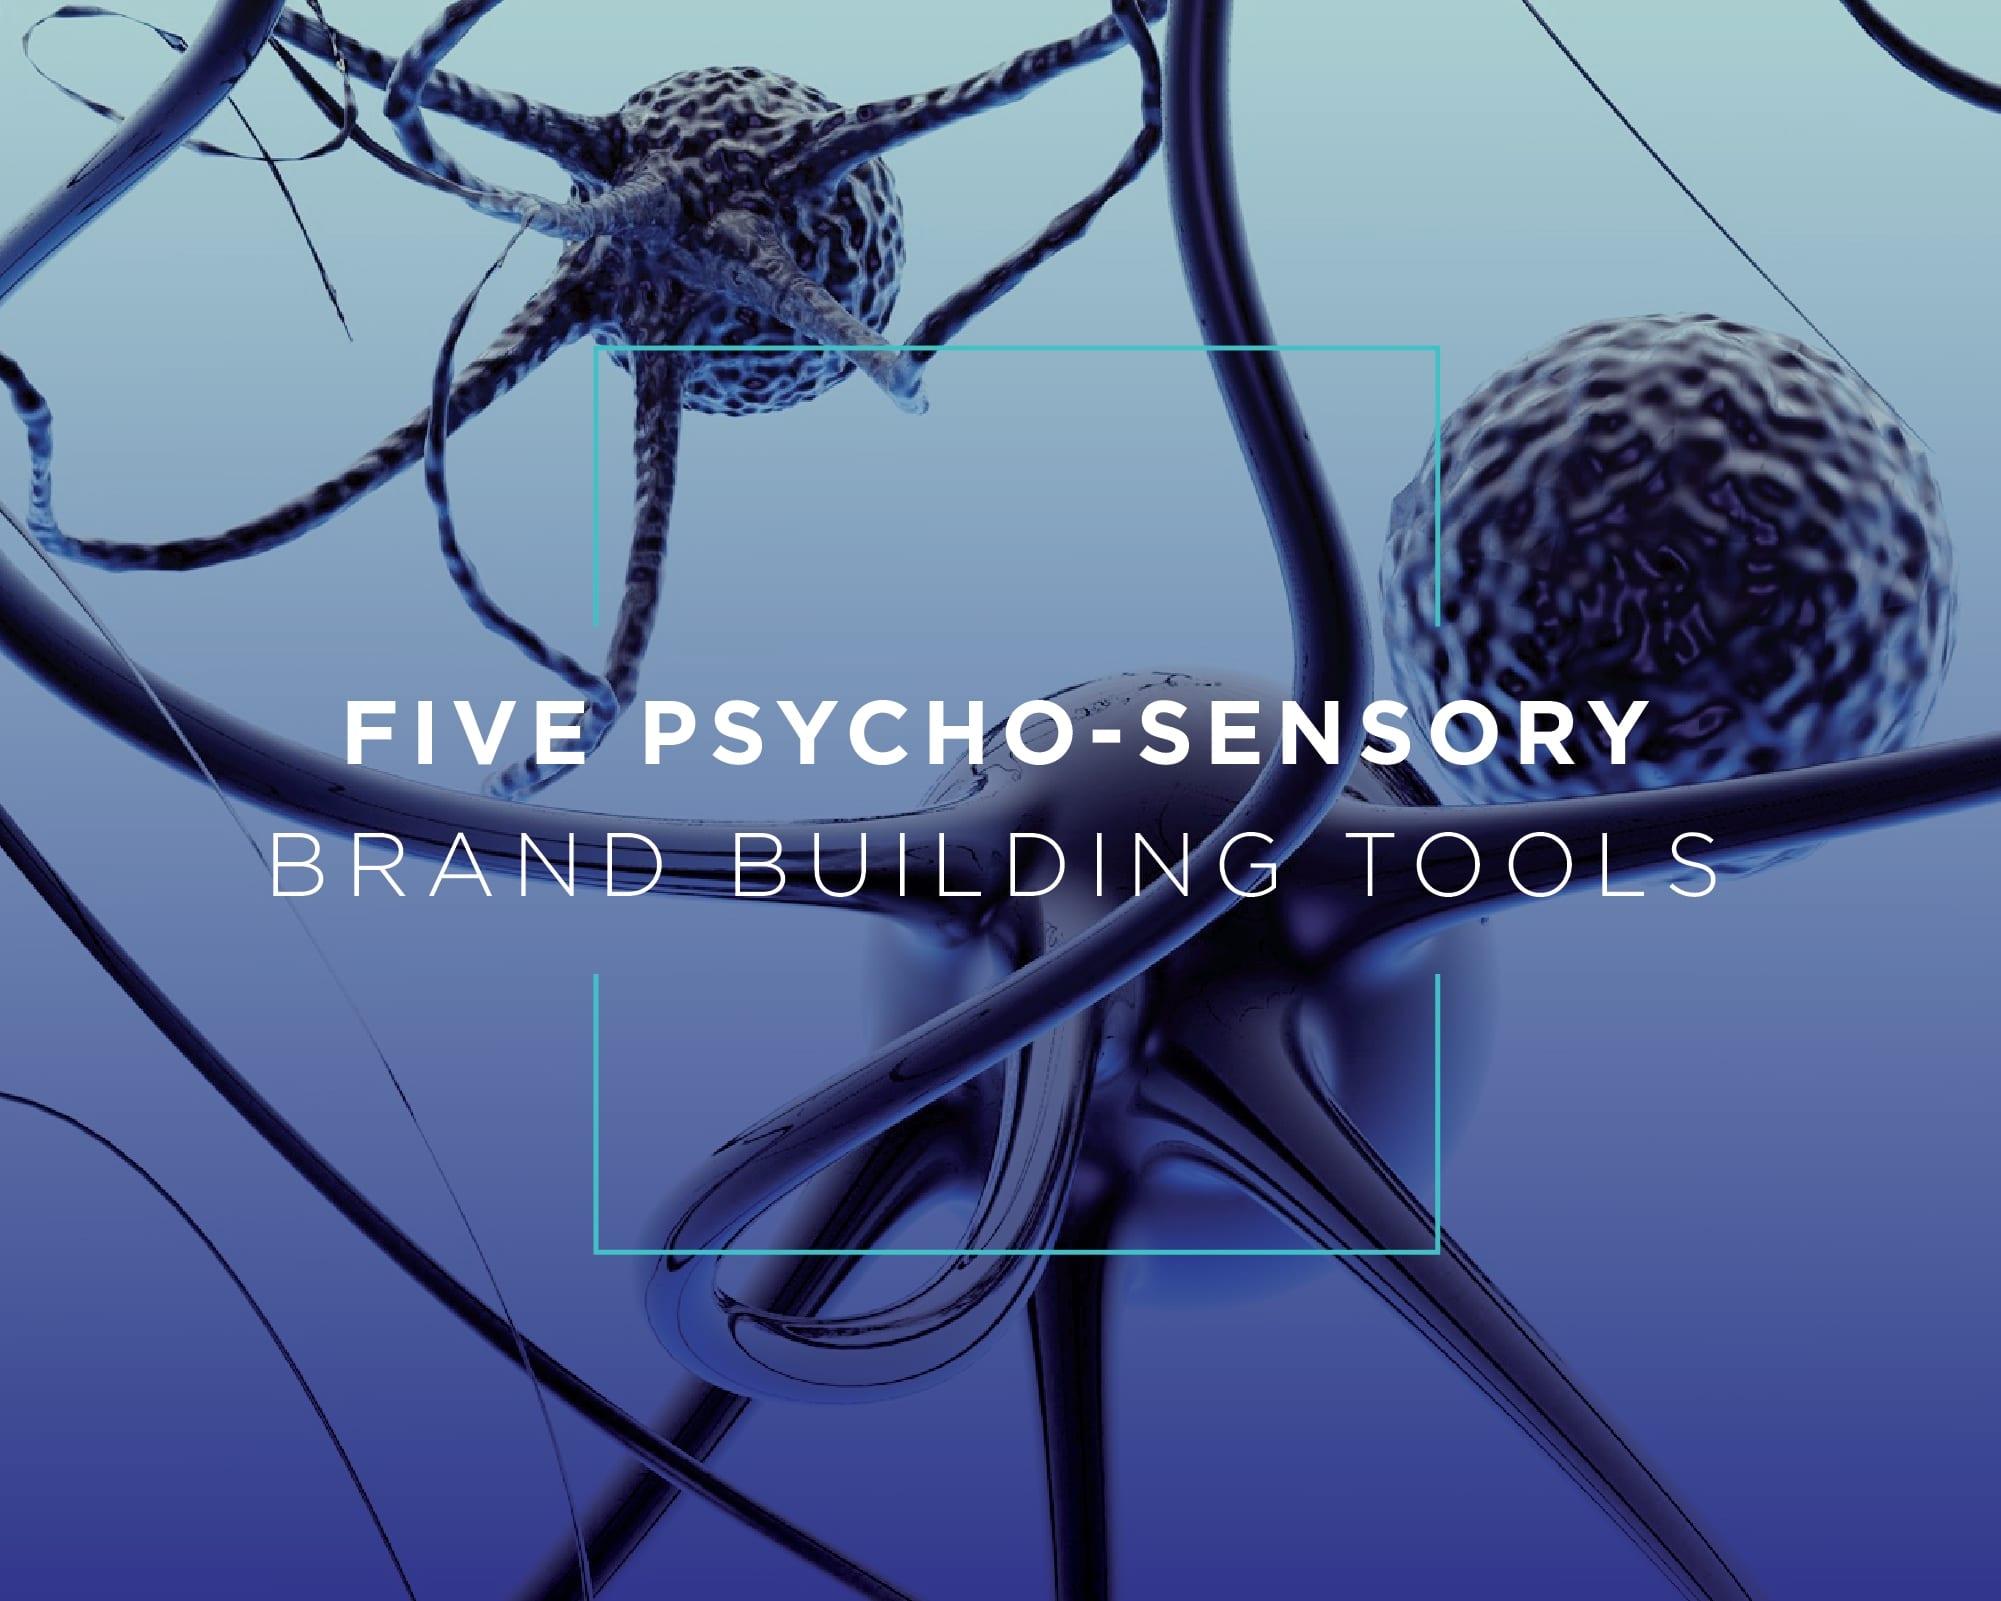 psycho-sensory brand-building tools